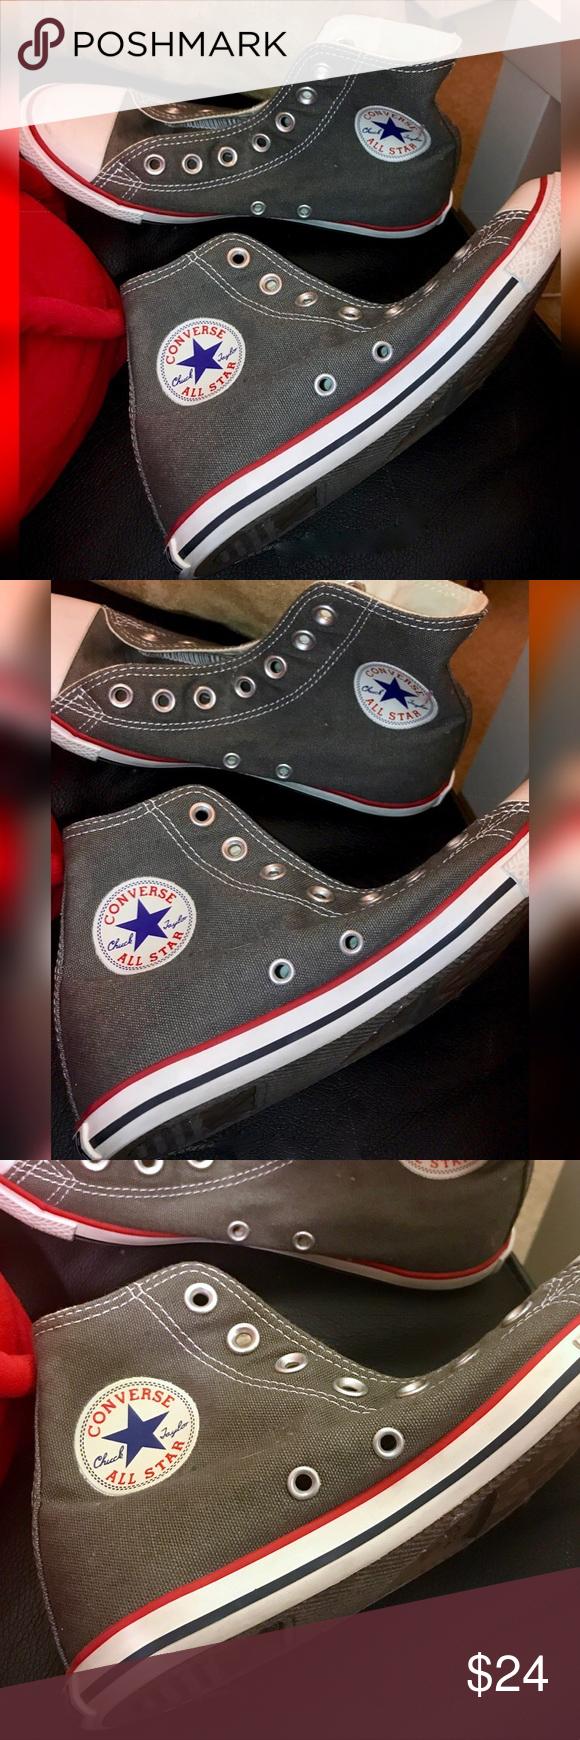 converse chuck taylor slim hi, Converse Shoes, Sneakers